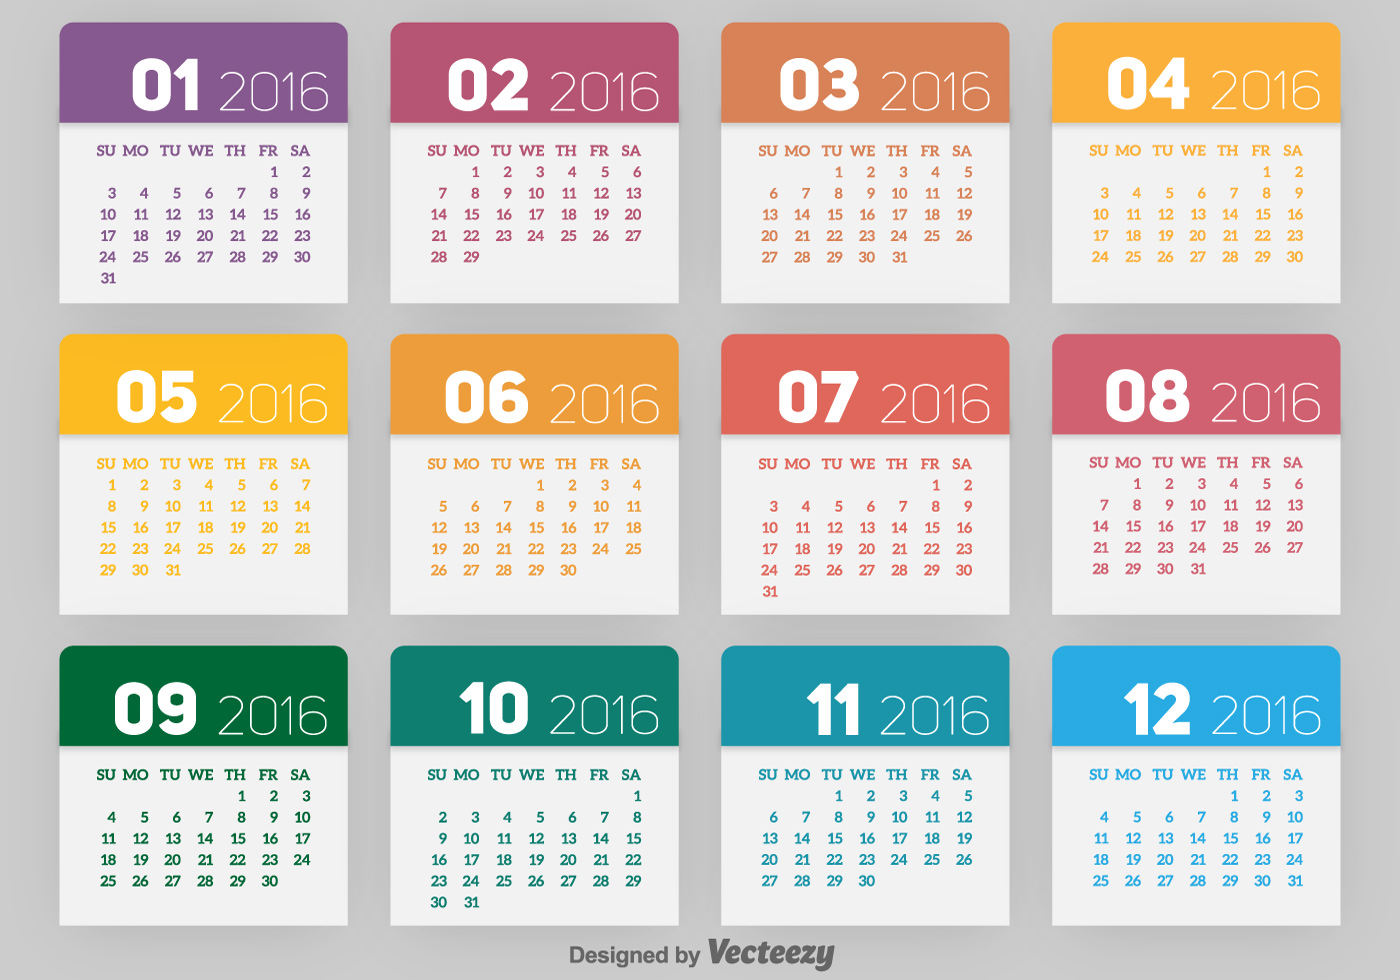 2016 calendar clipart png download 2016 Calendar Free Vector Art - (663 Free Downloads) png download